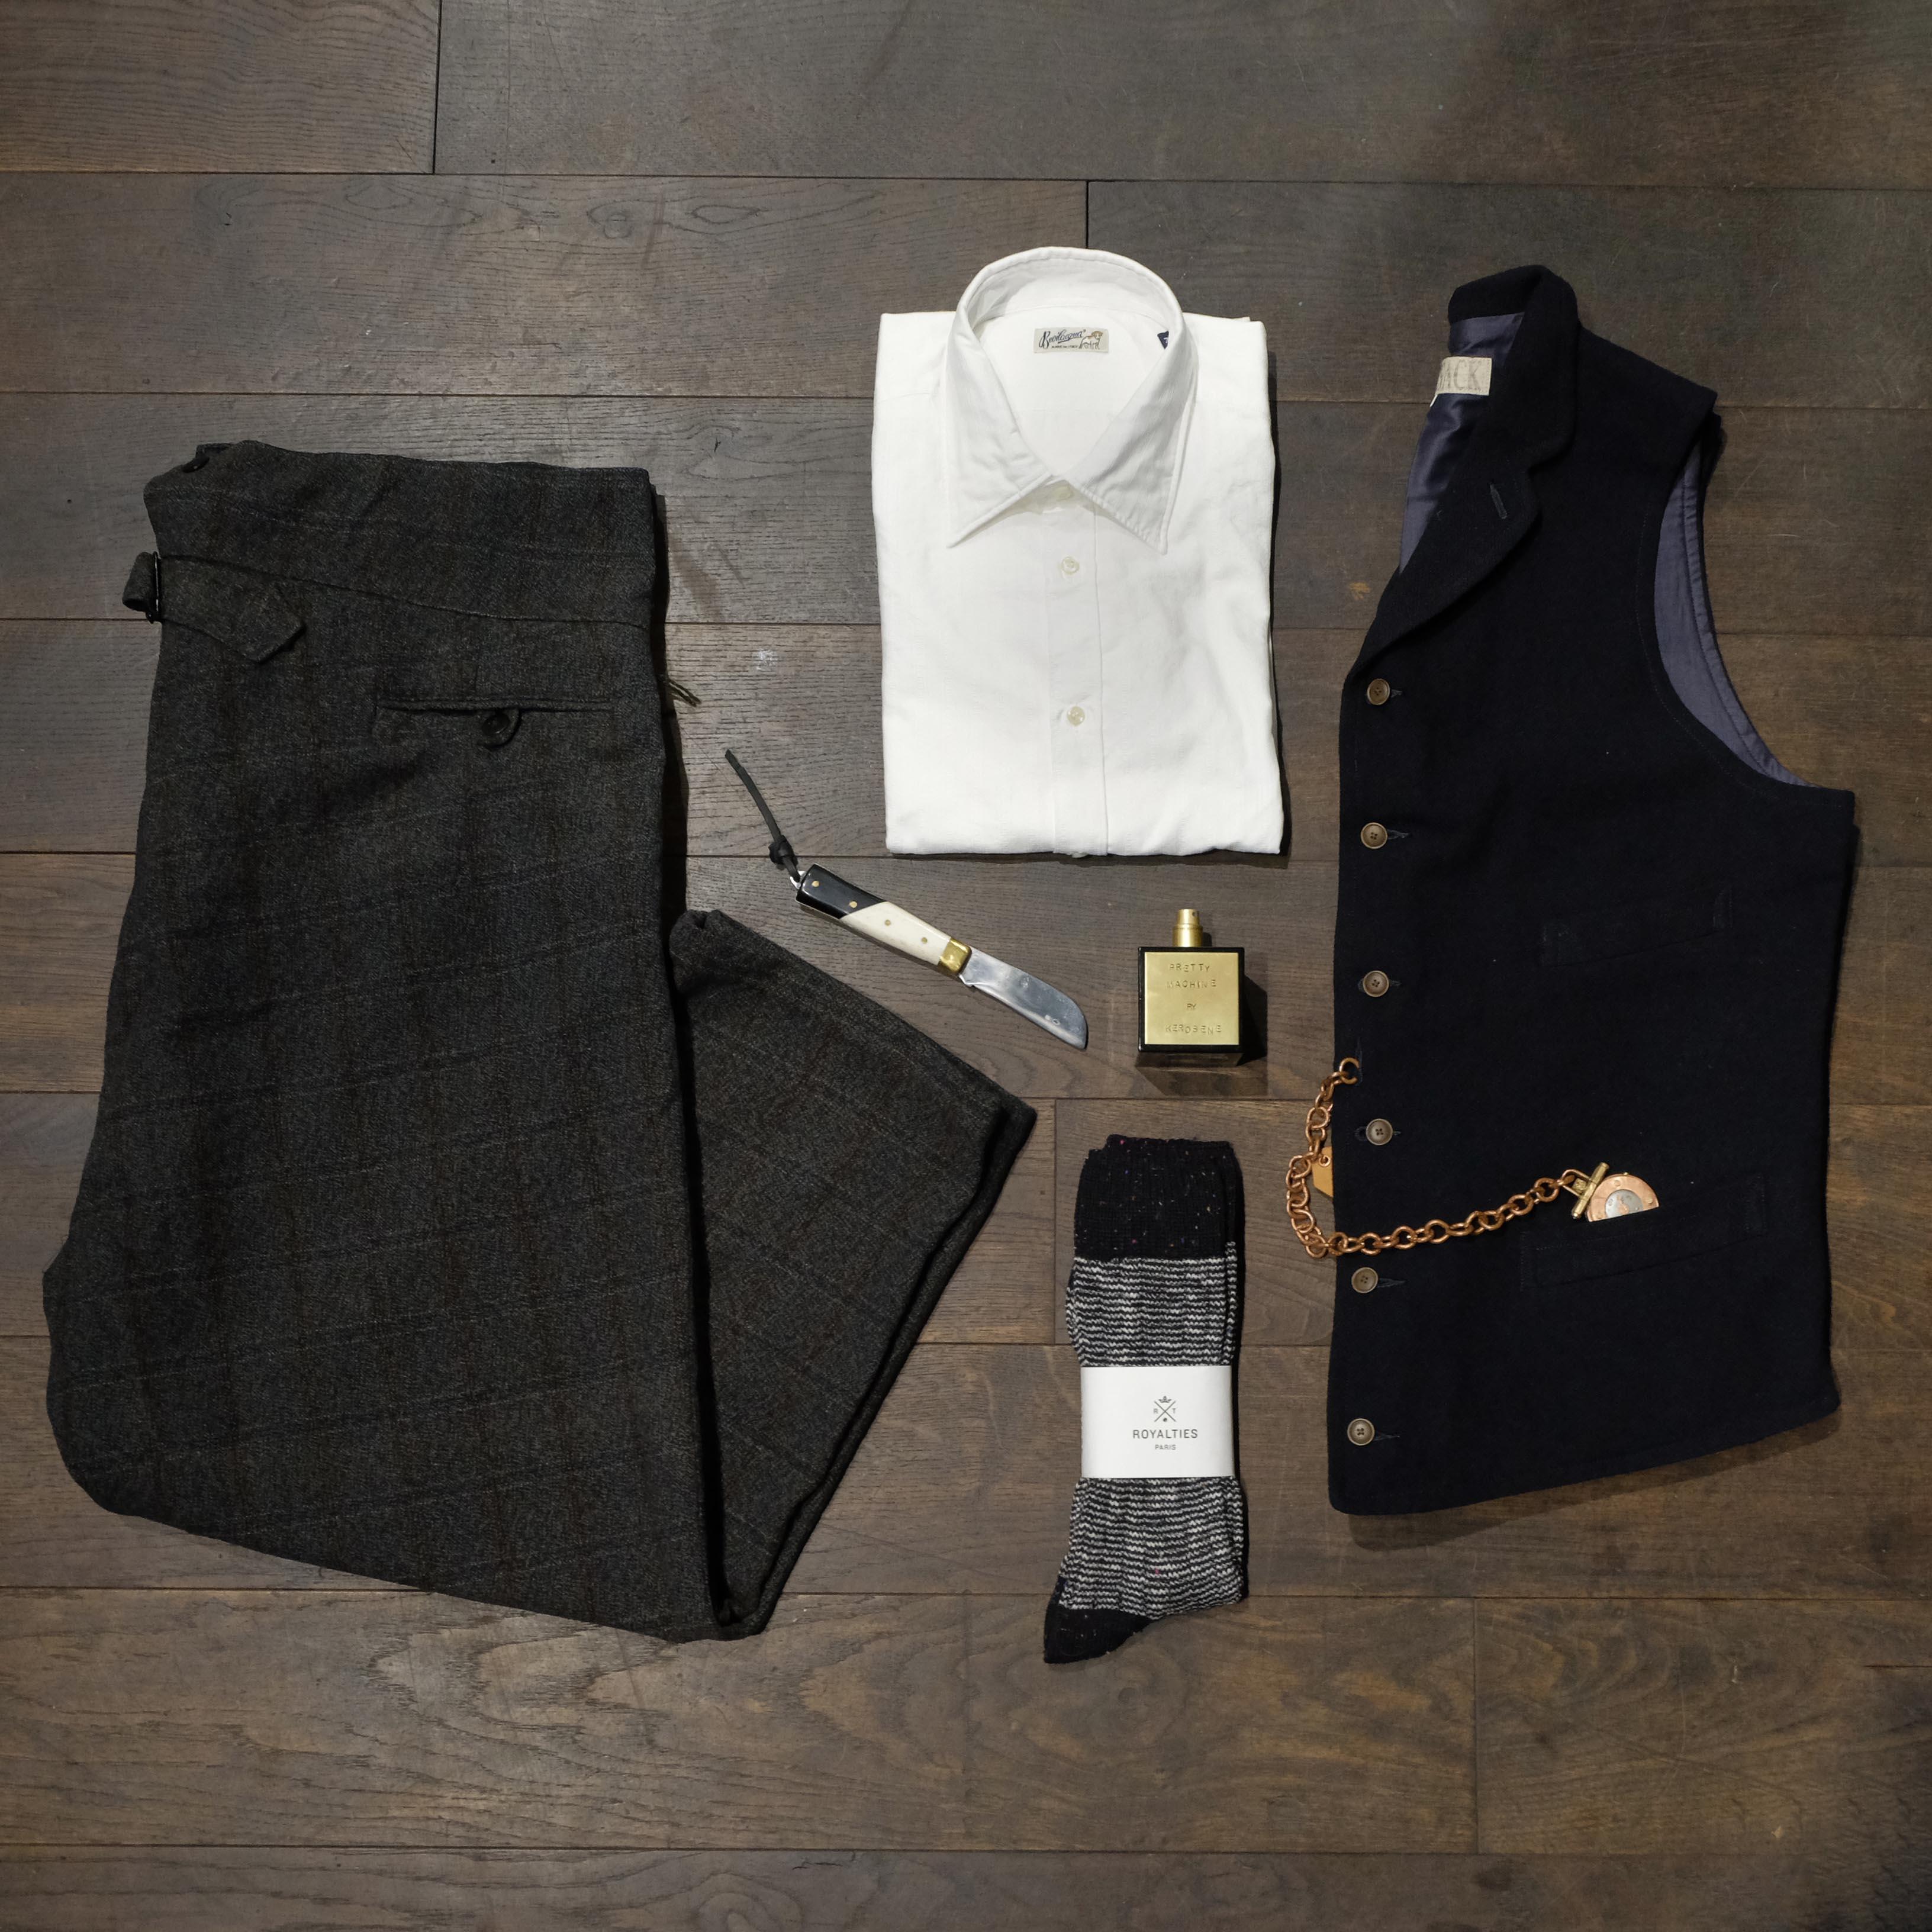 outfit-vintagehose-bevilacqua-maxpoglia-haversack-taschenuhr